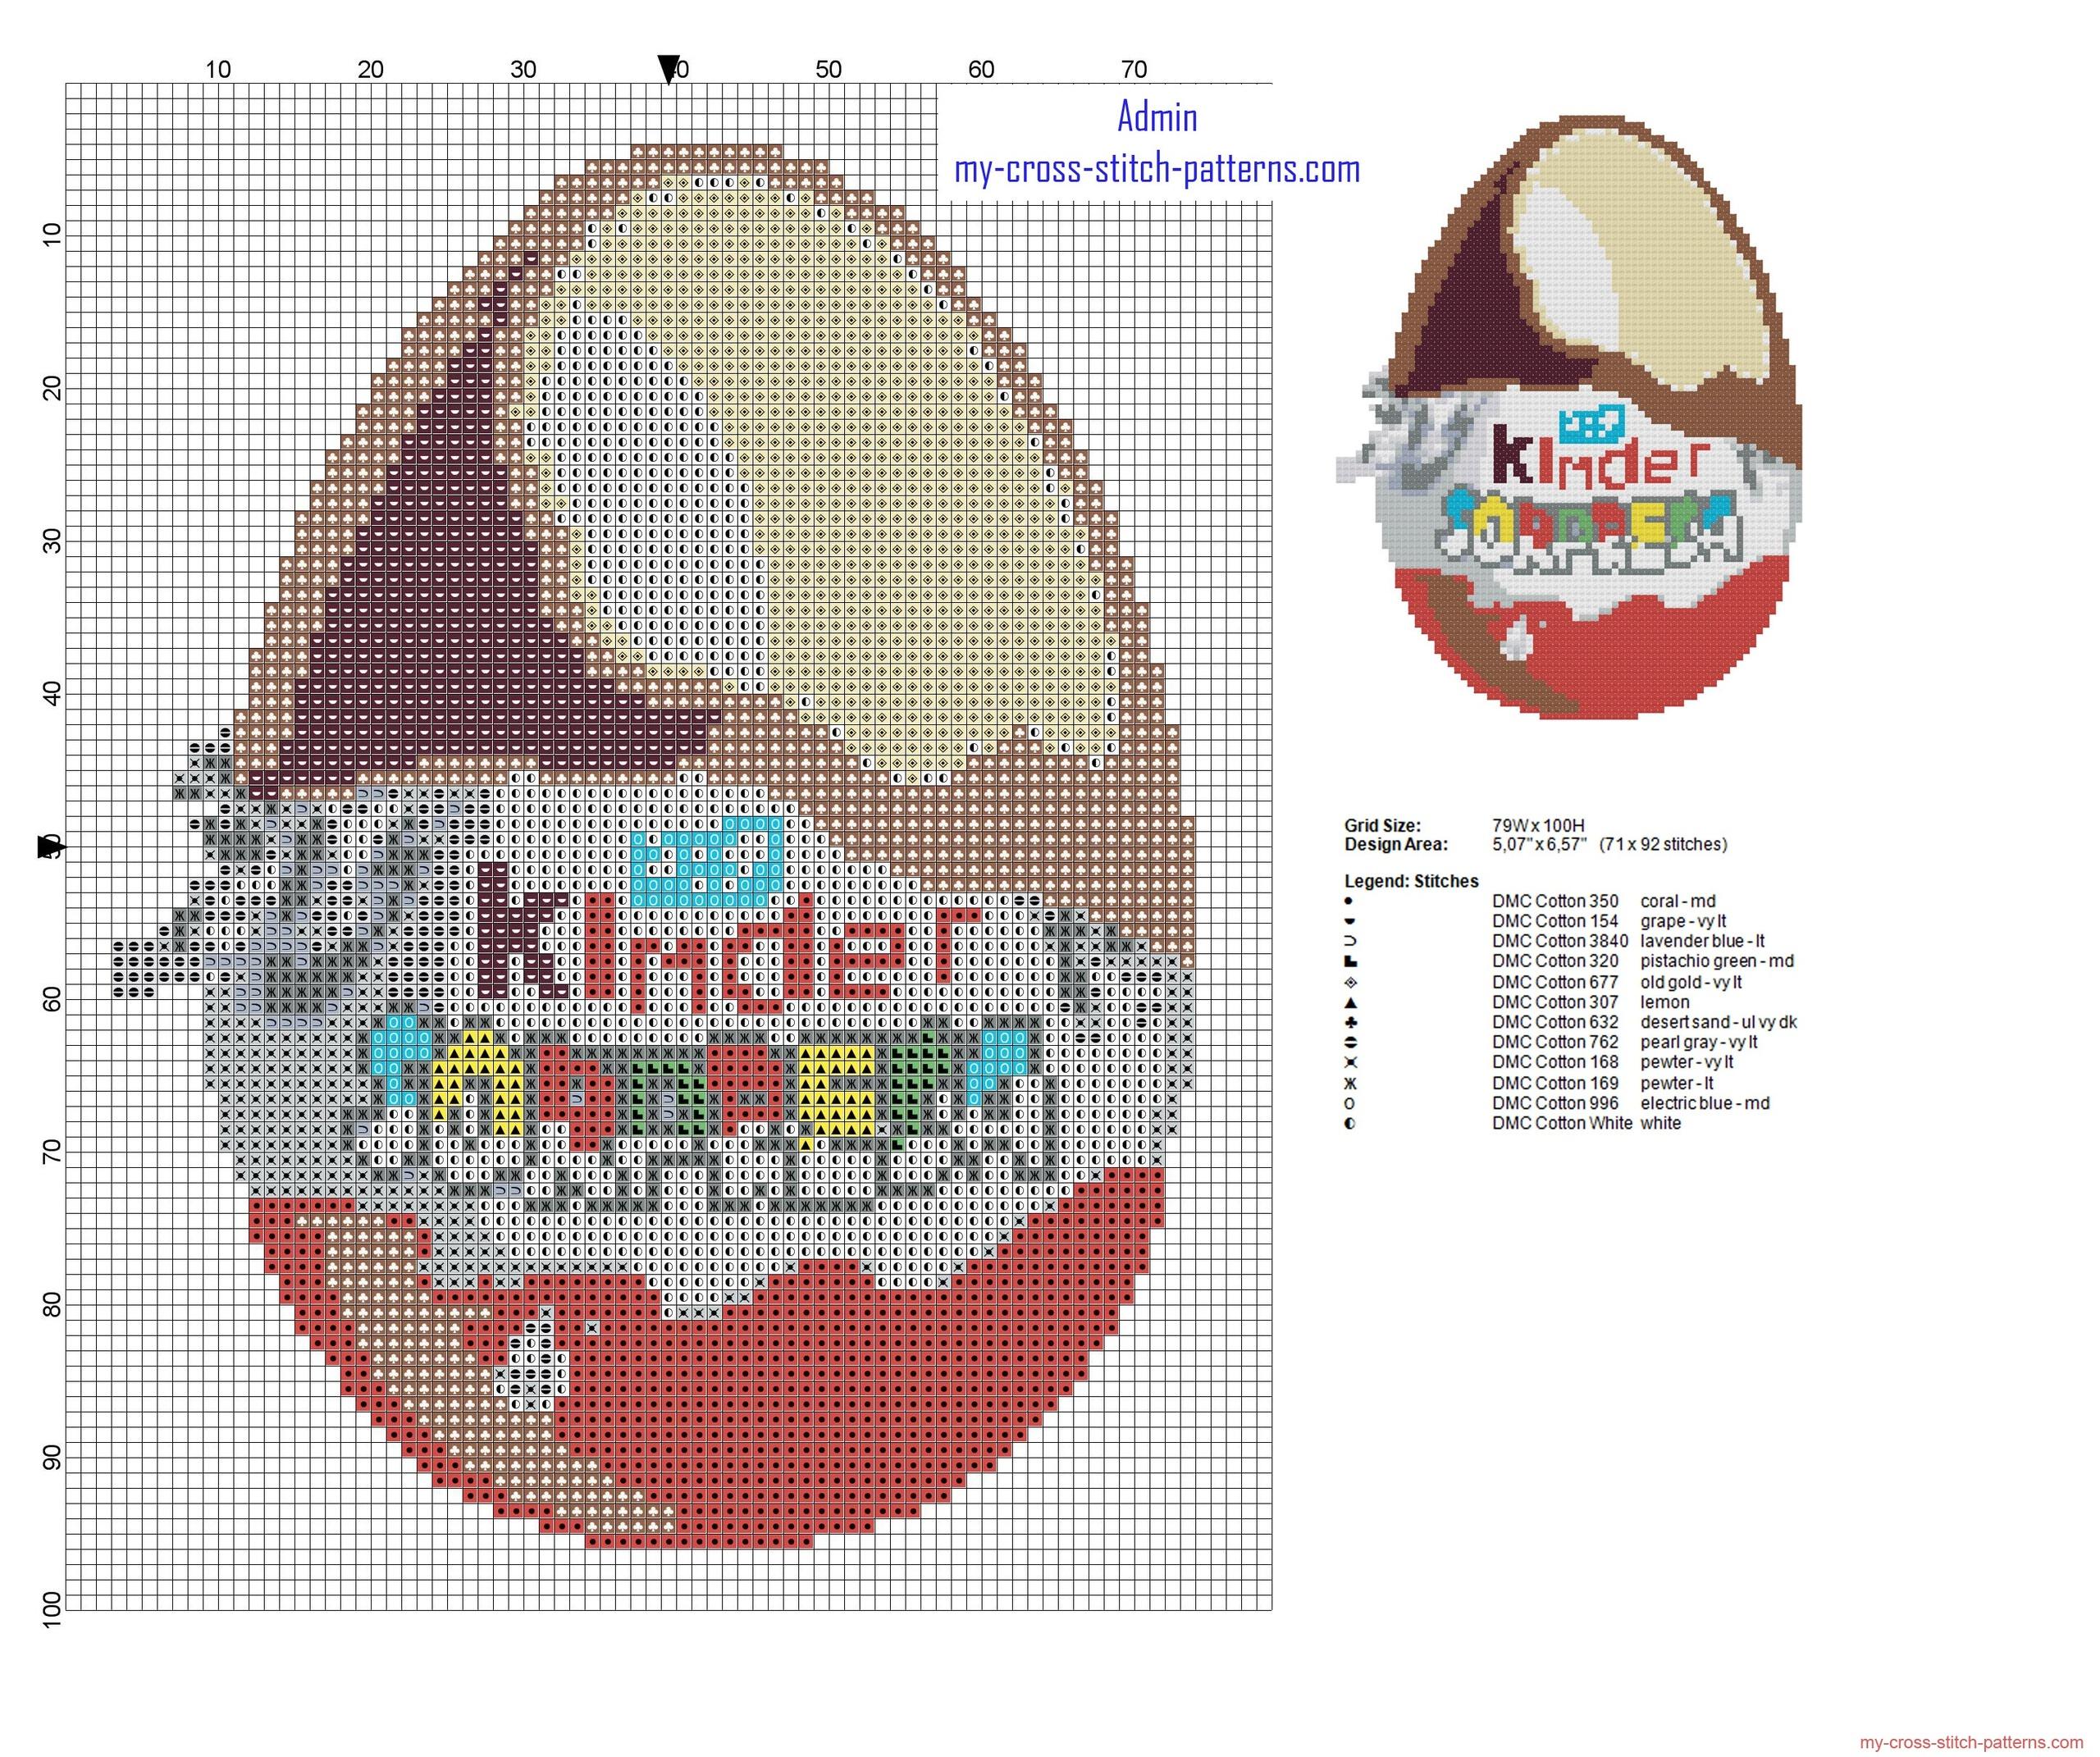 kinder_surprise_kinder_egg_cross_stitch_pattern_height_100_stitches